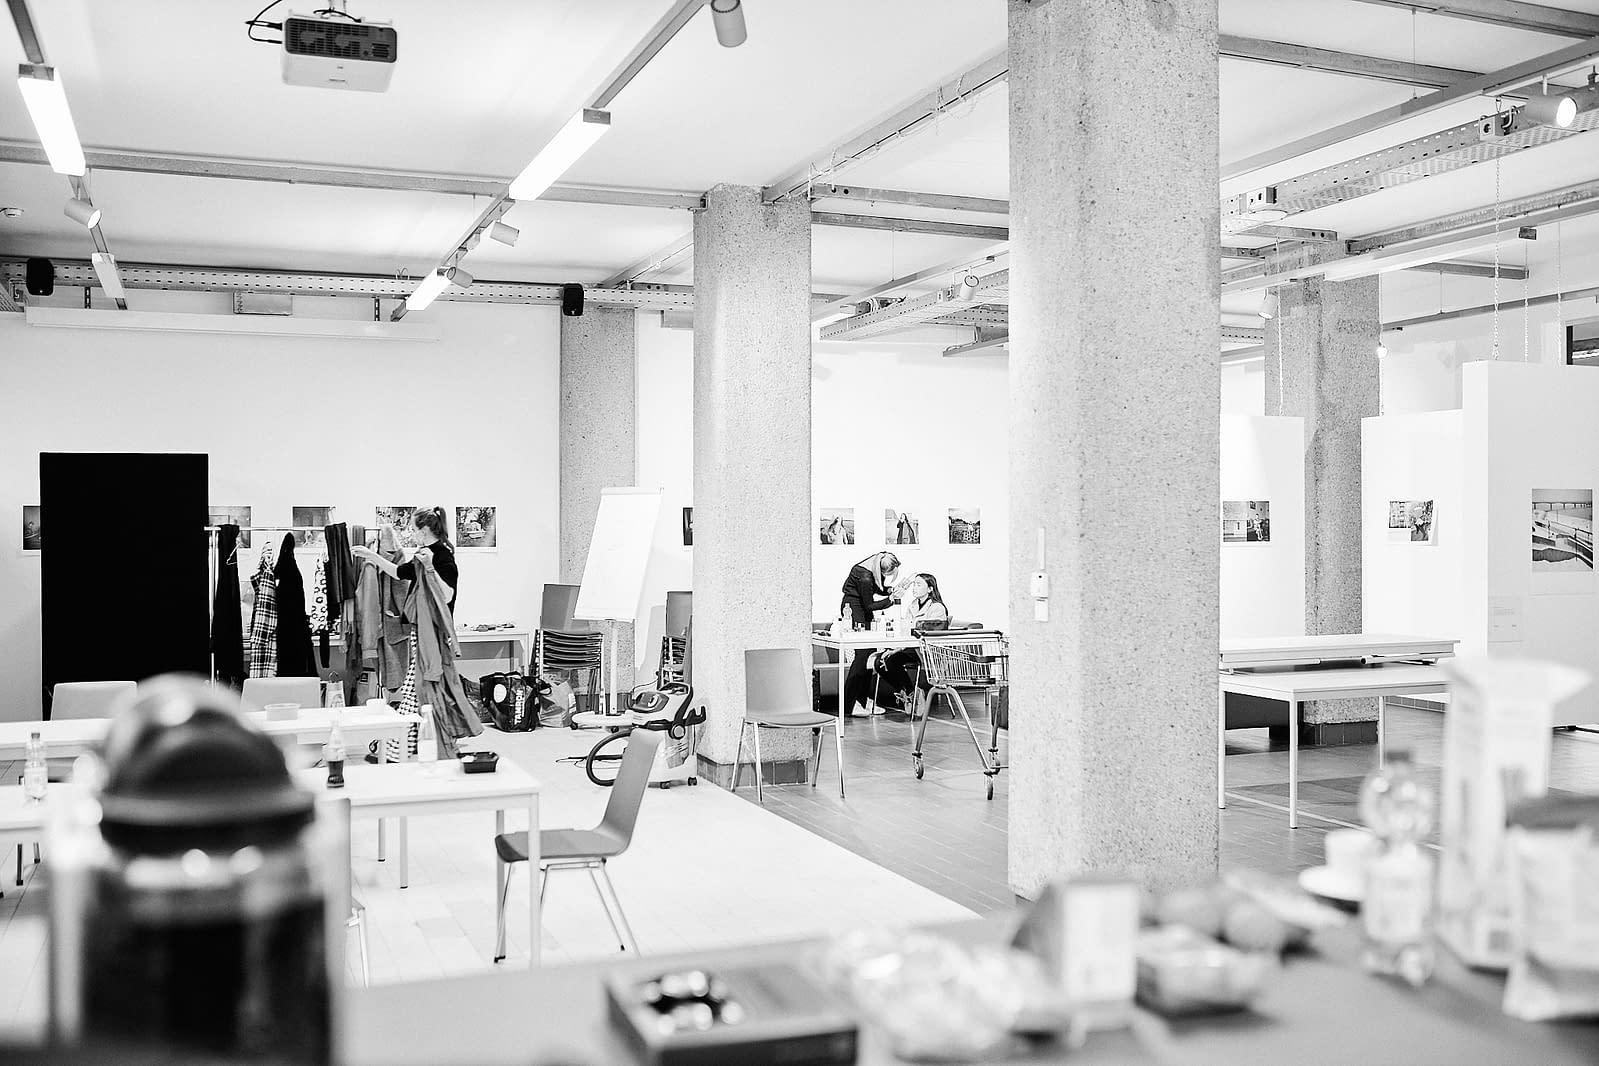 Prager Fotoschule – Behind the Scenes